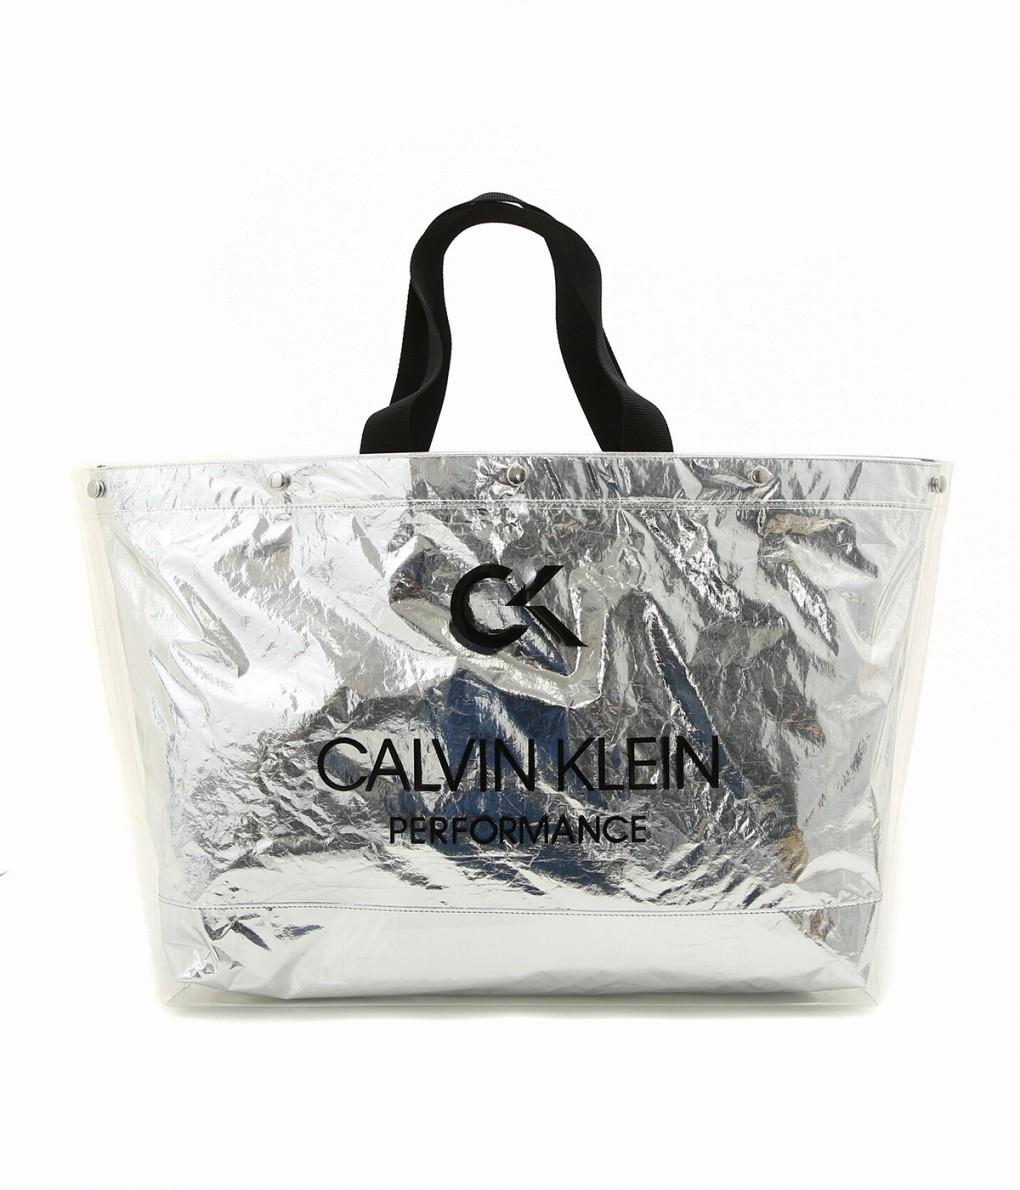 CALVIN KLEIN PERFORMANCE / カルバンクラインパフォーマンス : CK PERFORMANCE TOTE BAG - M : バッグ カルバンクライン カルヴァンクライン CK レディース : CKP-1908019【DEA】